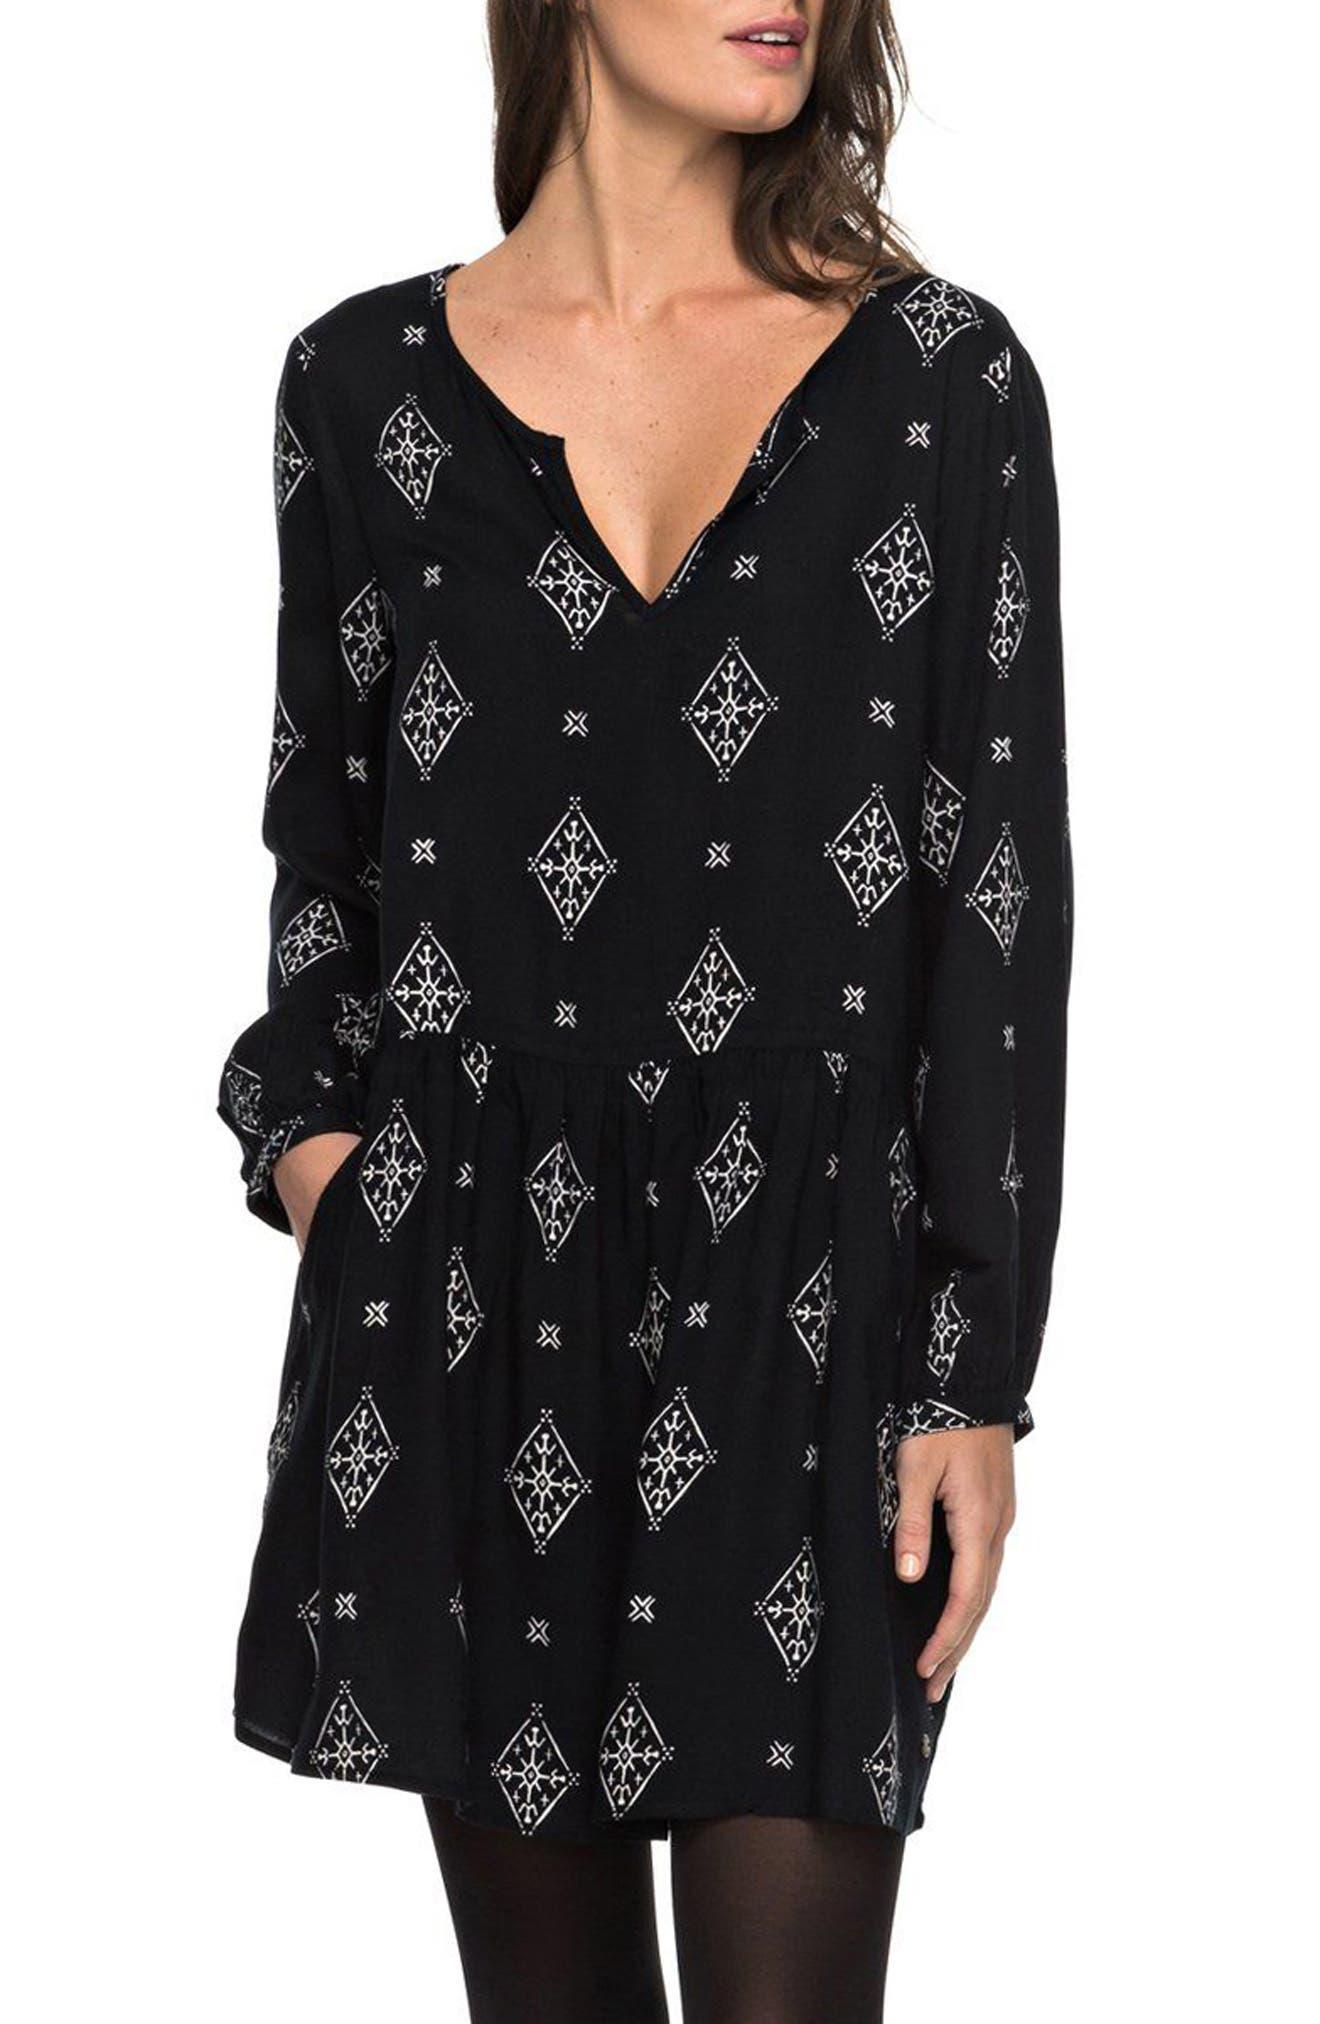 Alternate Image 1 Selected - Roxy Sunkissed Daze Print Swing Dress